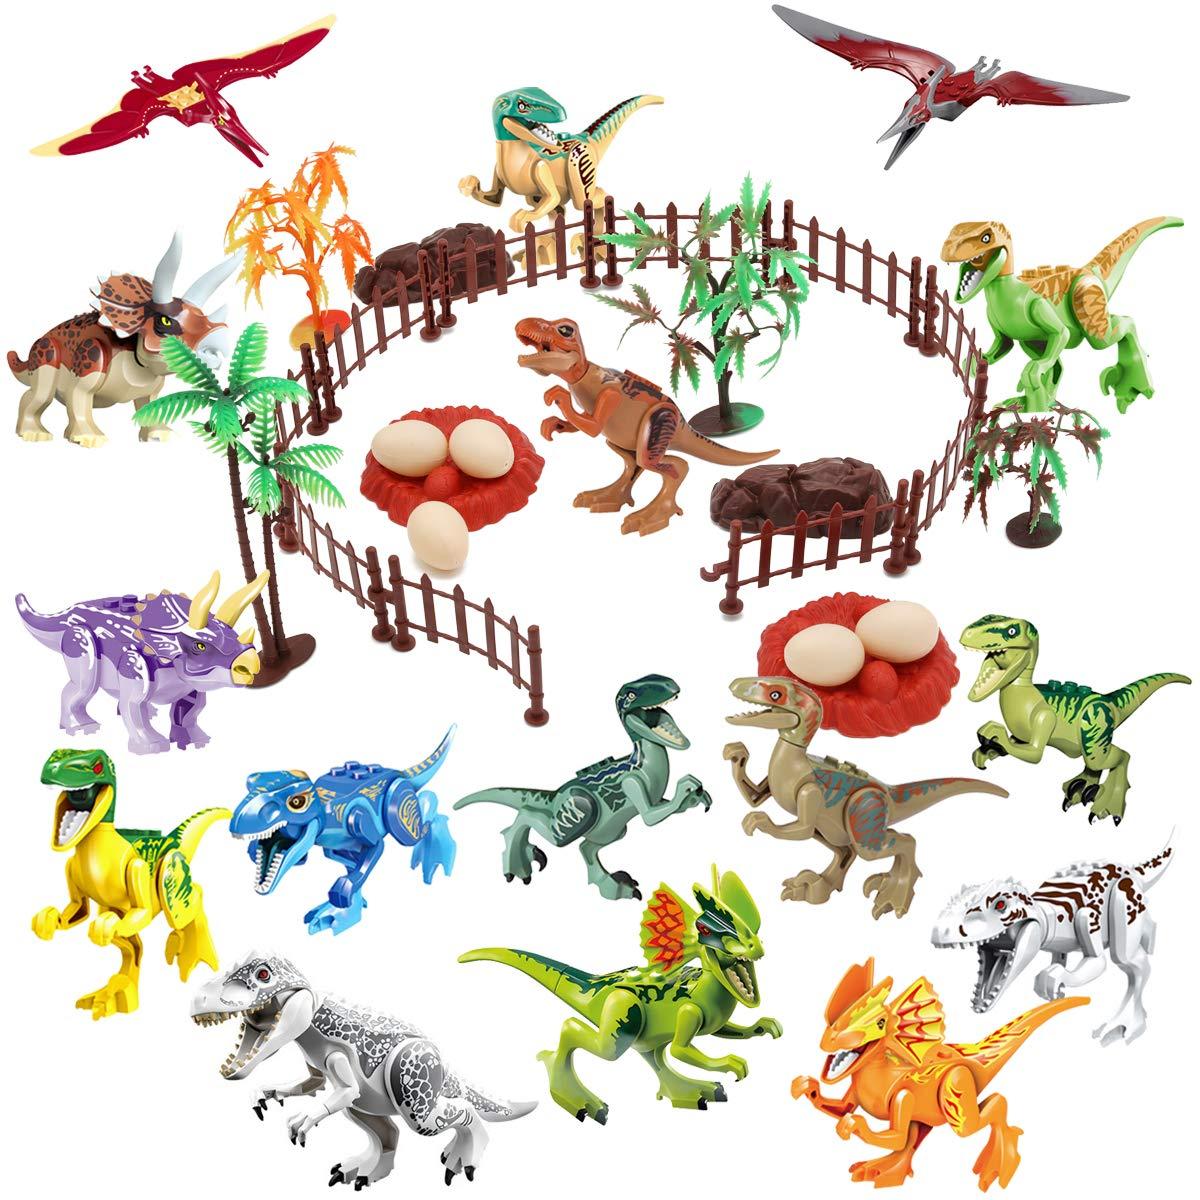 Winrase DIY Dinosaur Building Blocks Toys Set 16pcs Buildable Jurassic Predator Herbivore Dinosaur Building Blocks Figures with Movable Jaws and 23pcs Dinosaur Scene Configuration Park